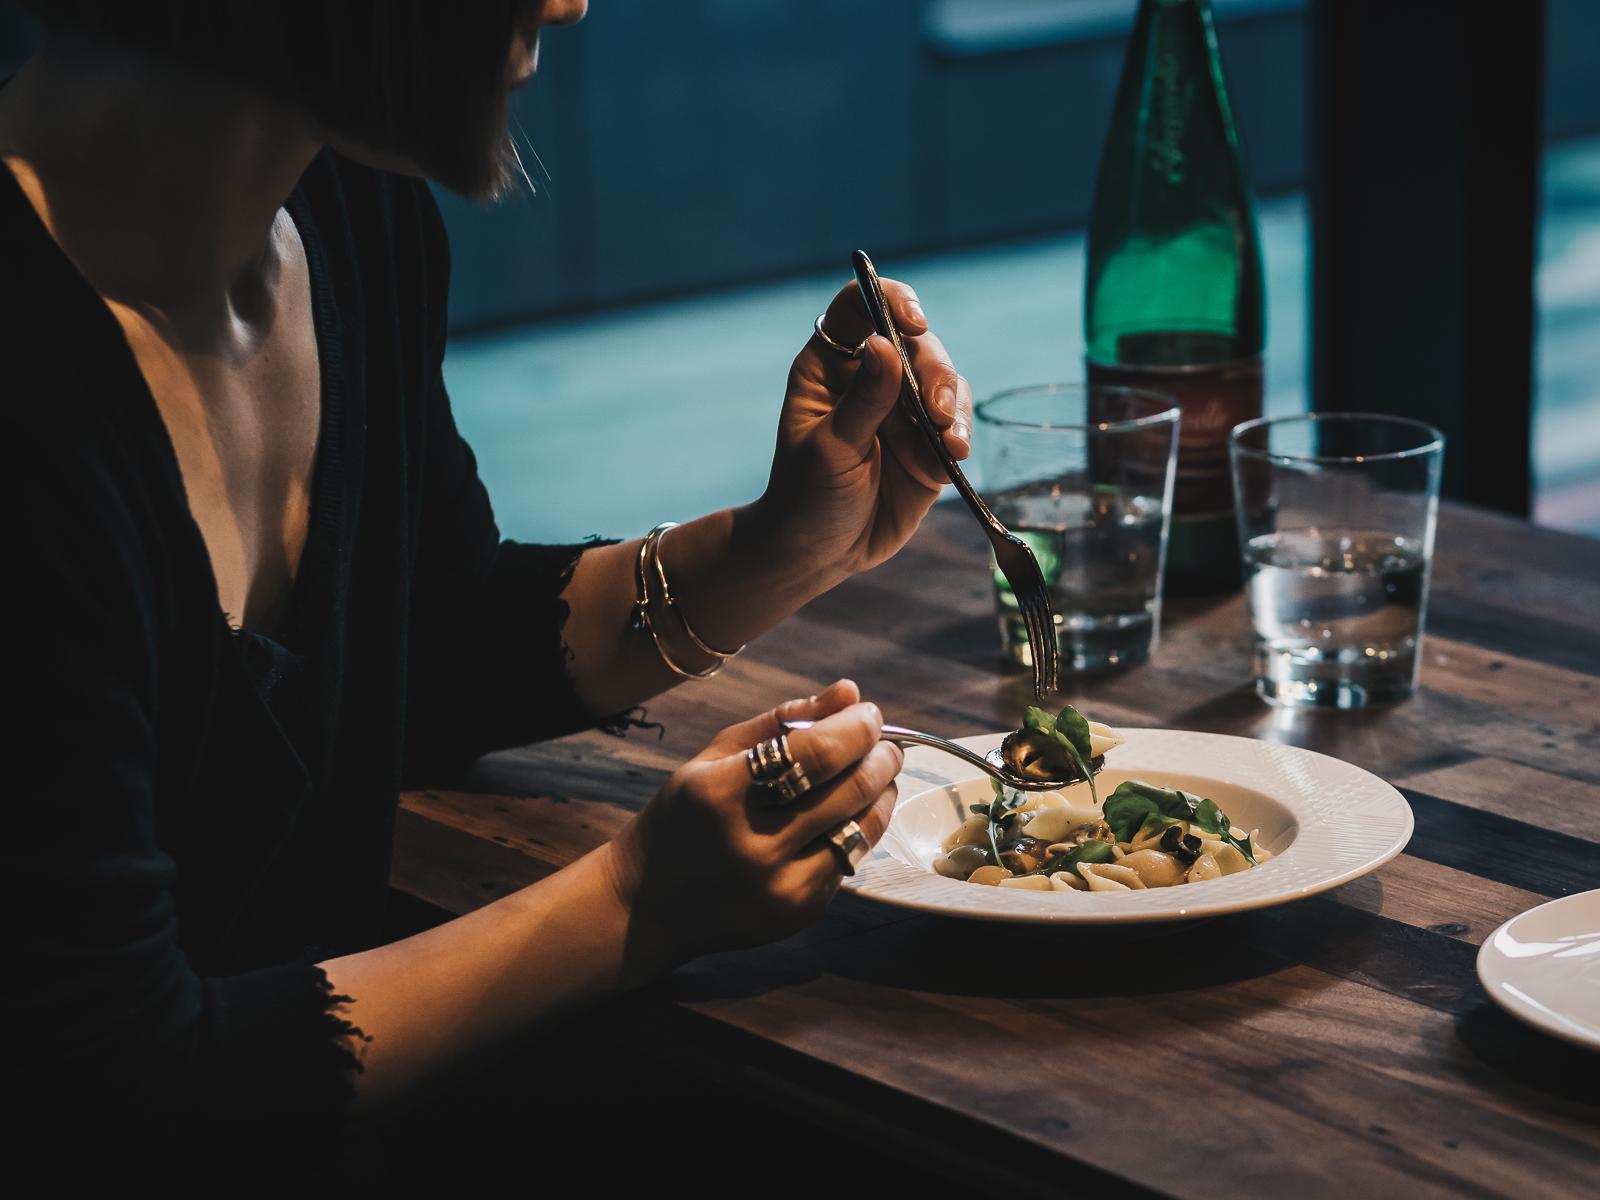 al sorriso -A Place to enjoy tasty food -